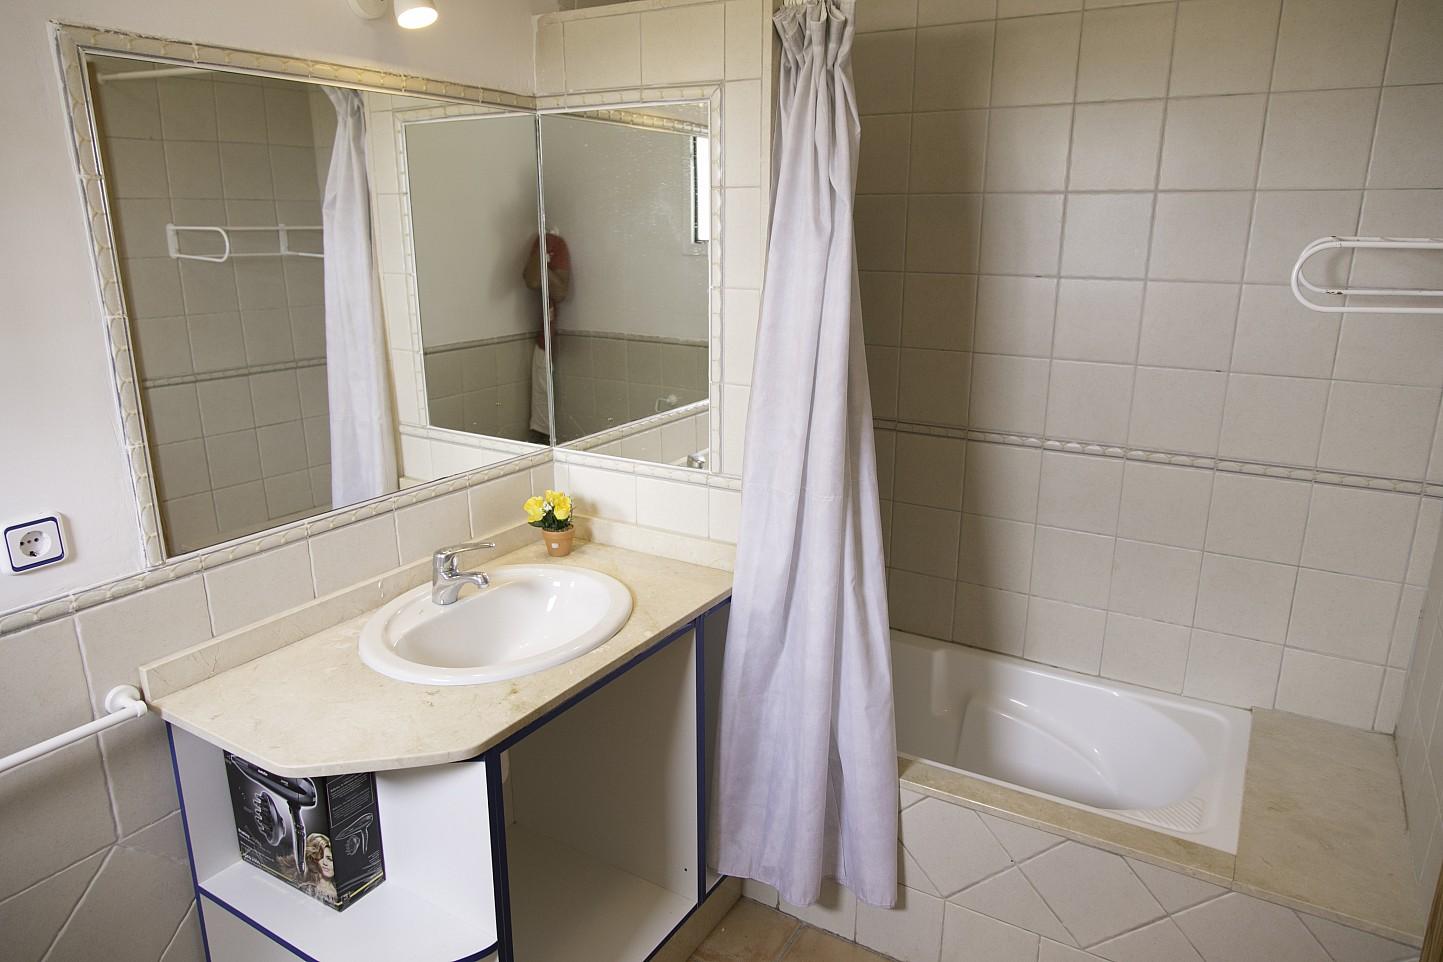 Baño con bañera de bonita casa en venta en Urb. Villas de Cala Romántica en Mallorca